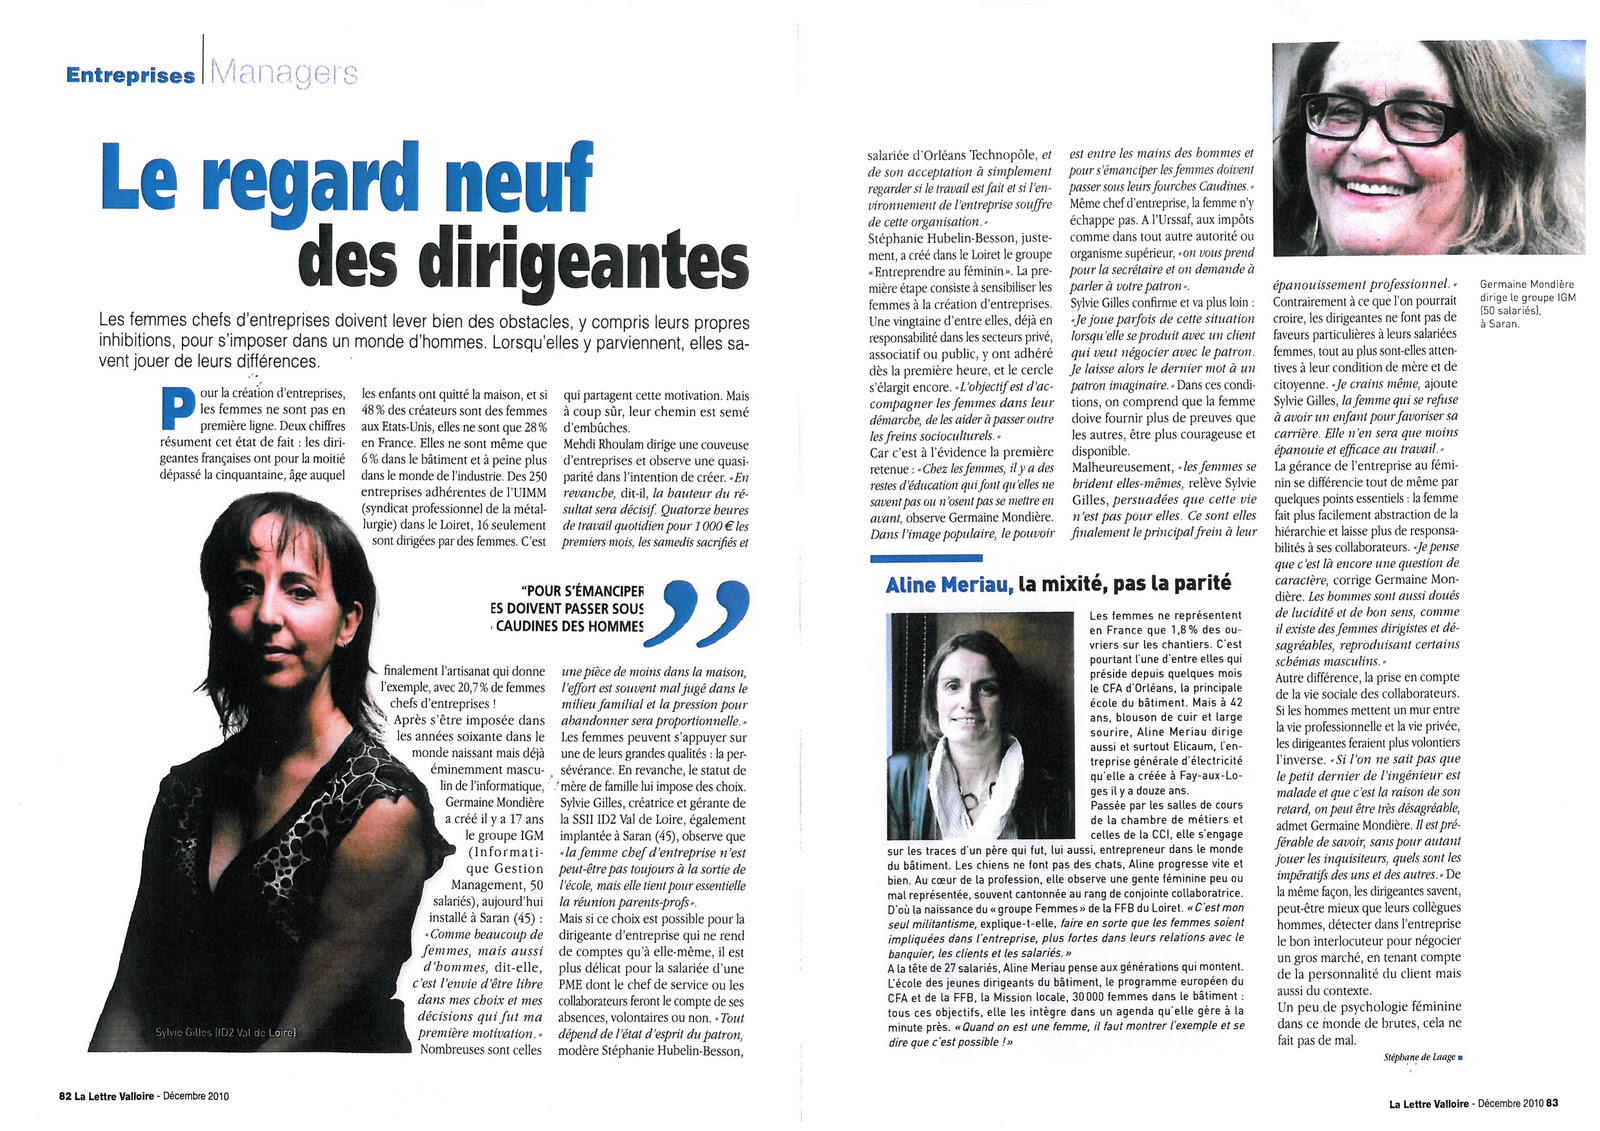 LettreValloiredecembre2010